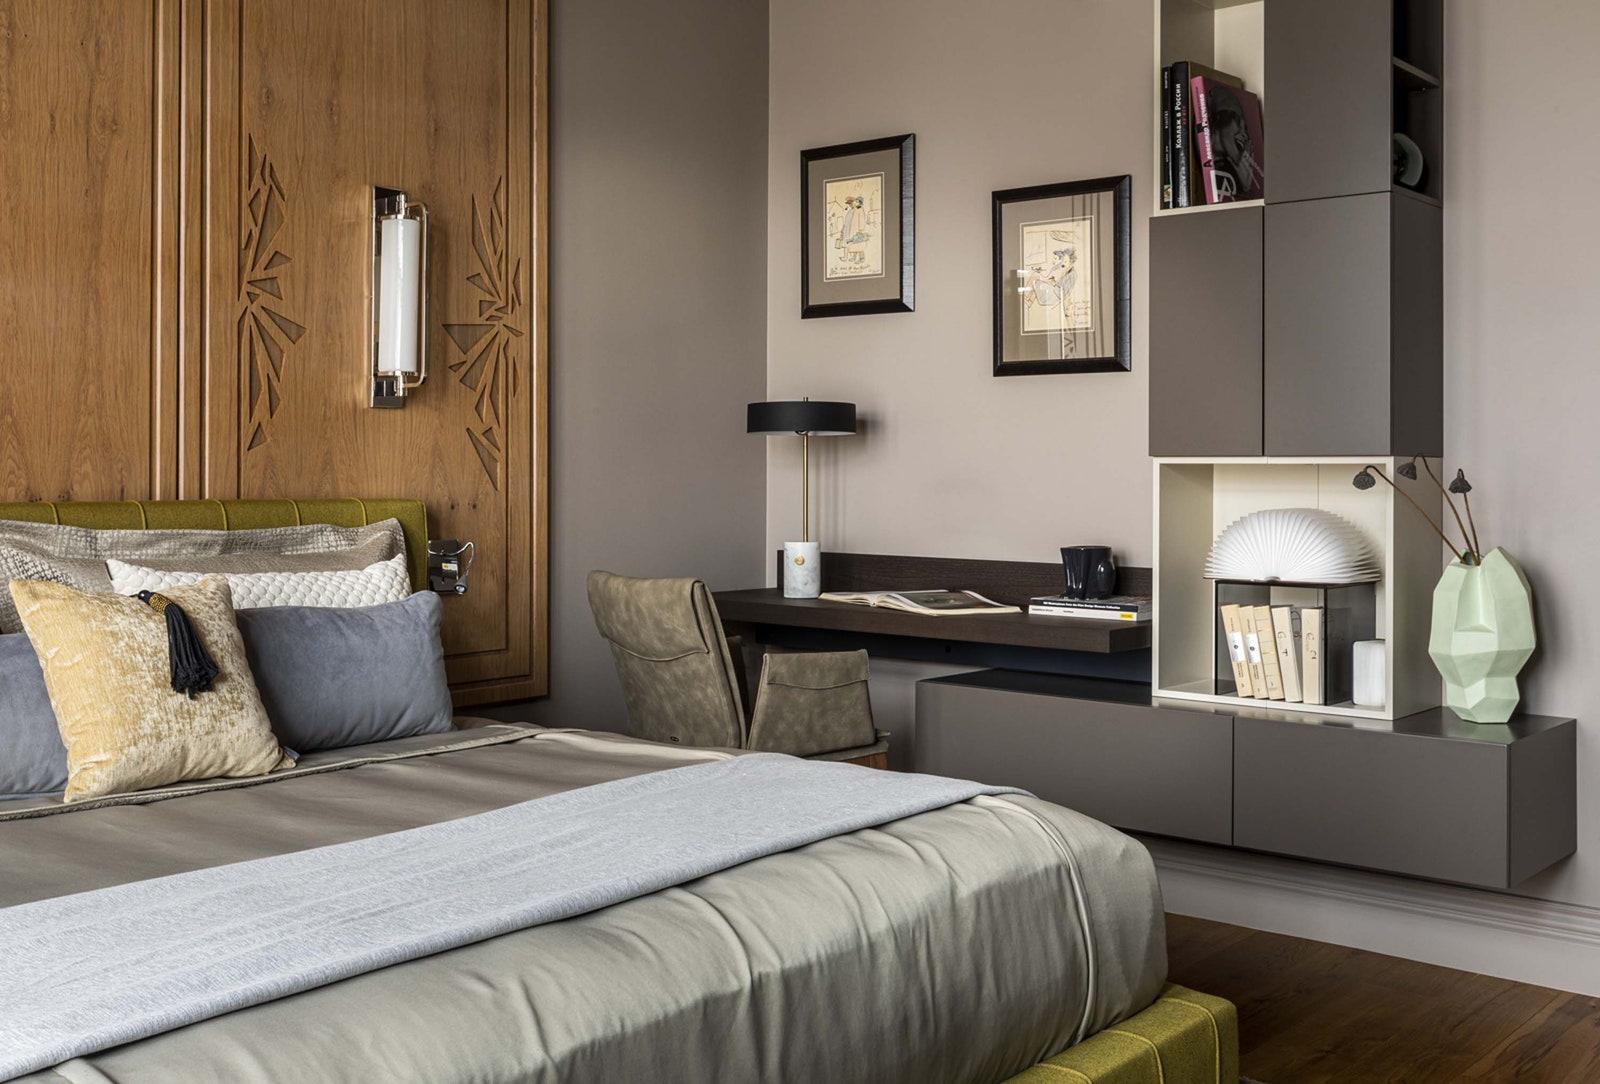 .      Molteni  Visual Comfort amp Co.  Loffilab  Family Hall  Benjamin Moore.